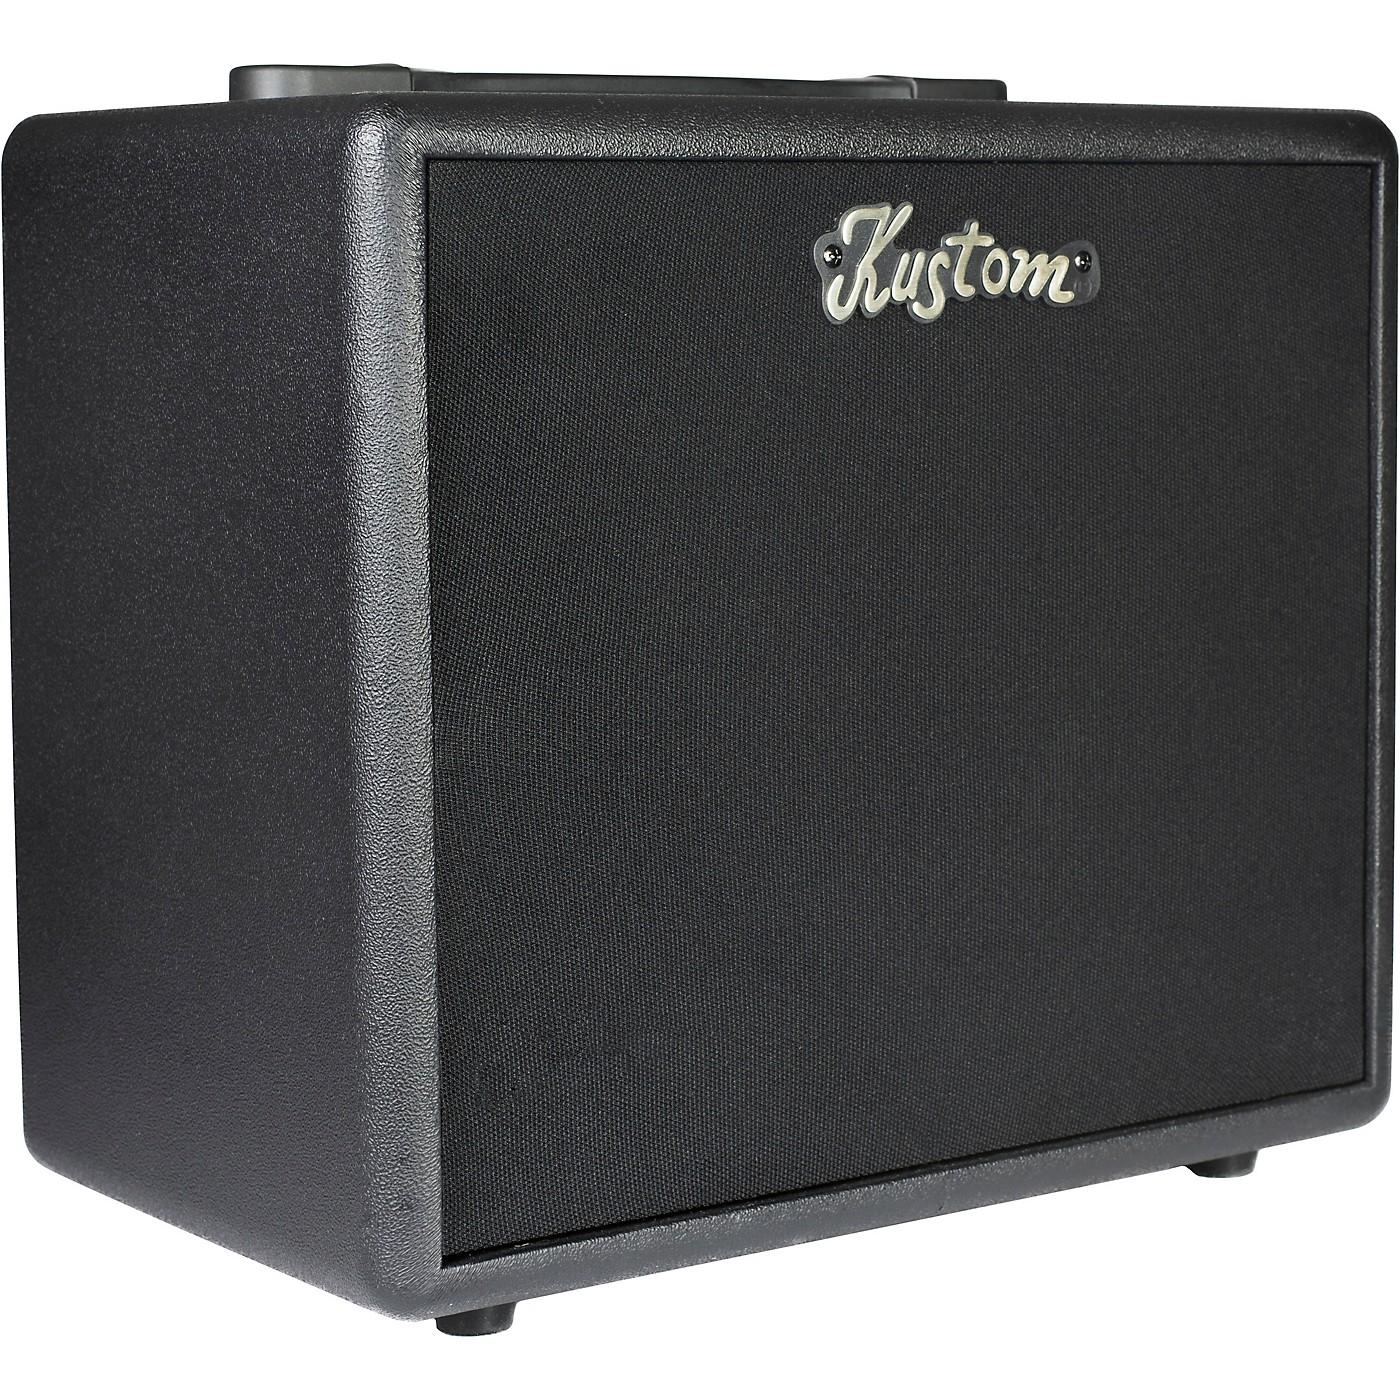 Kustom MOD-L20 20W 1x8 Guitar Combo Amplifier thumbnail